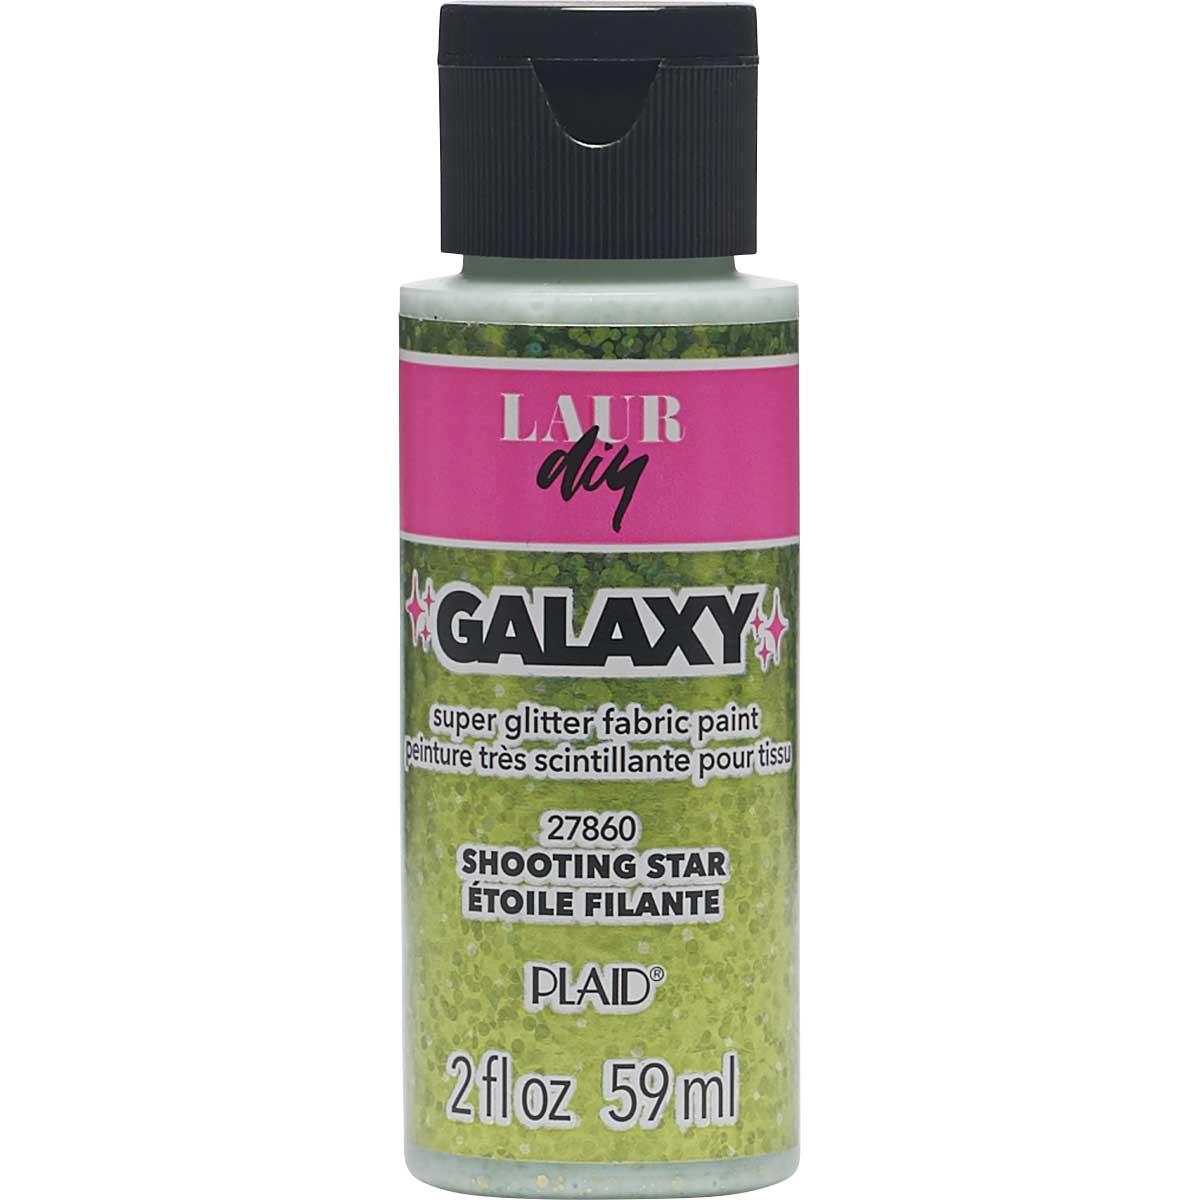 LaurDIY ® Galaxy Glitter Fabric Paint - Shooting Star, 2 oz.